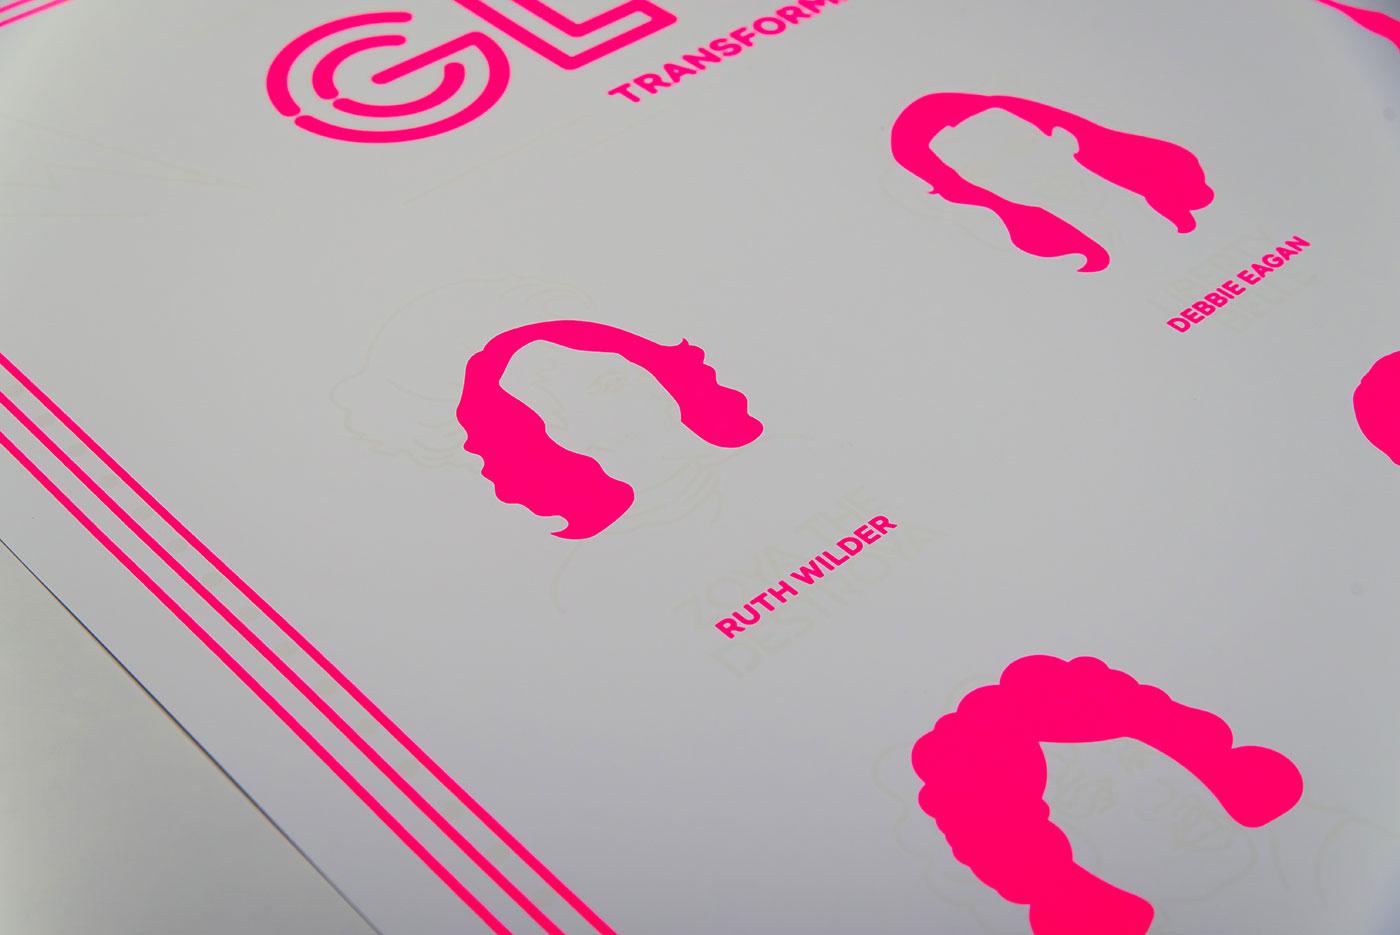 Netflix GLOW - poster design by upstruct